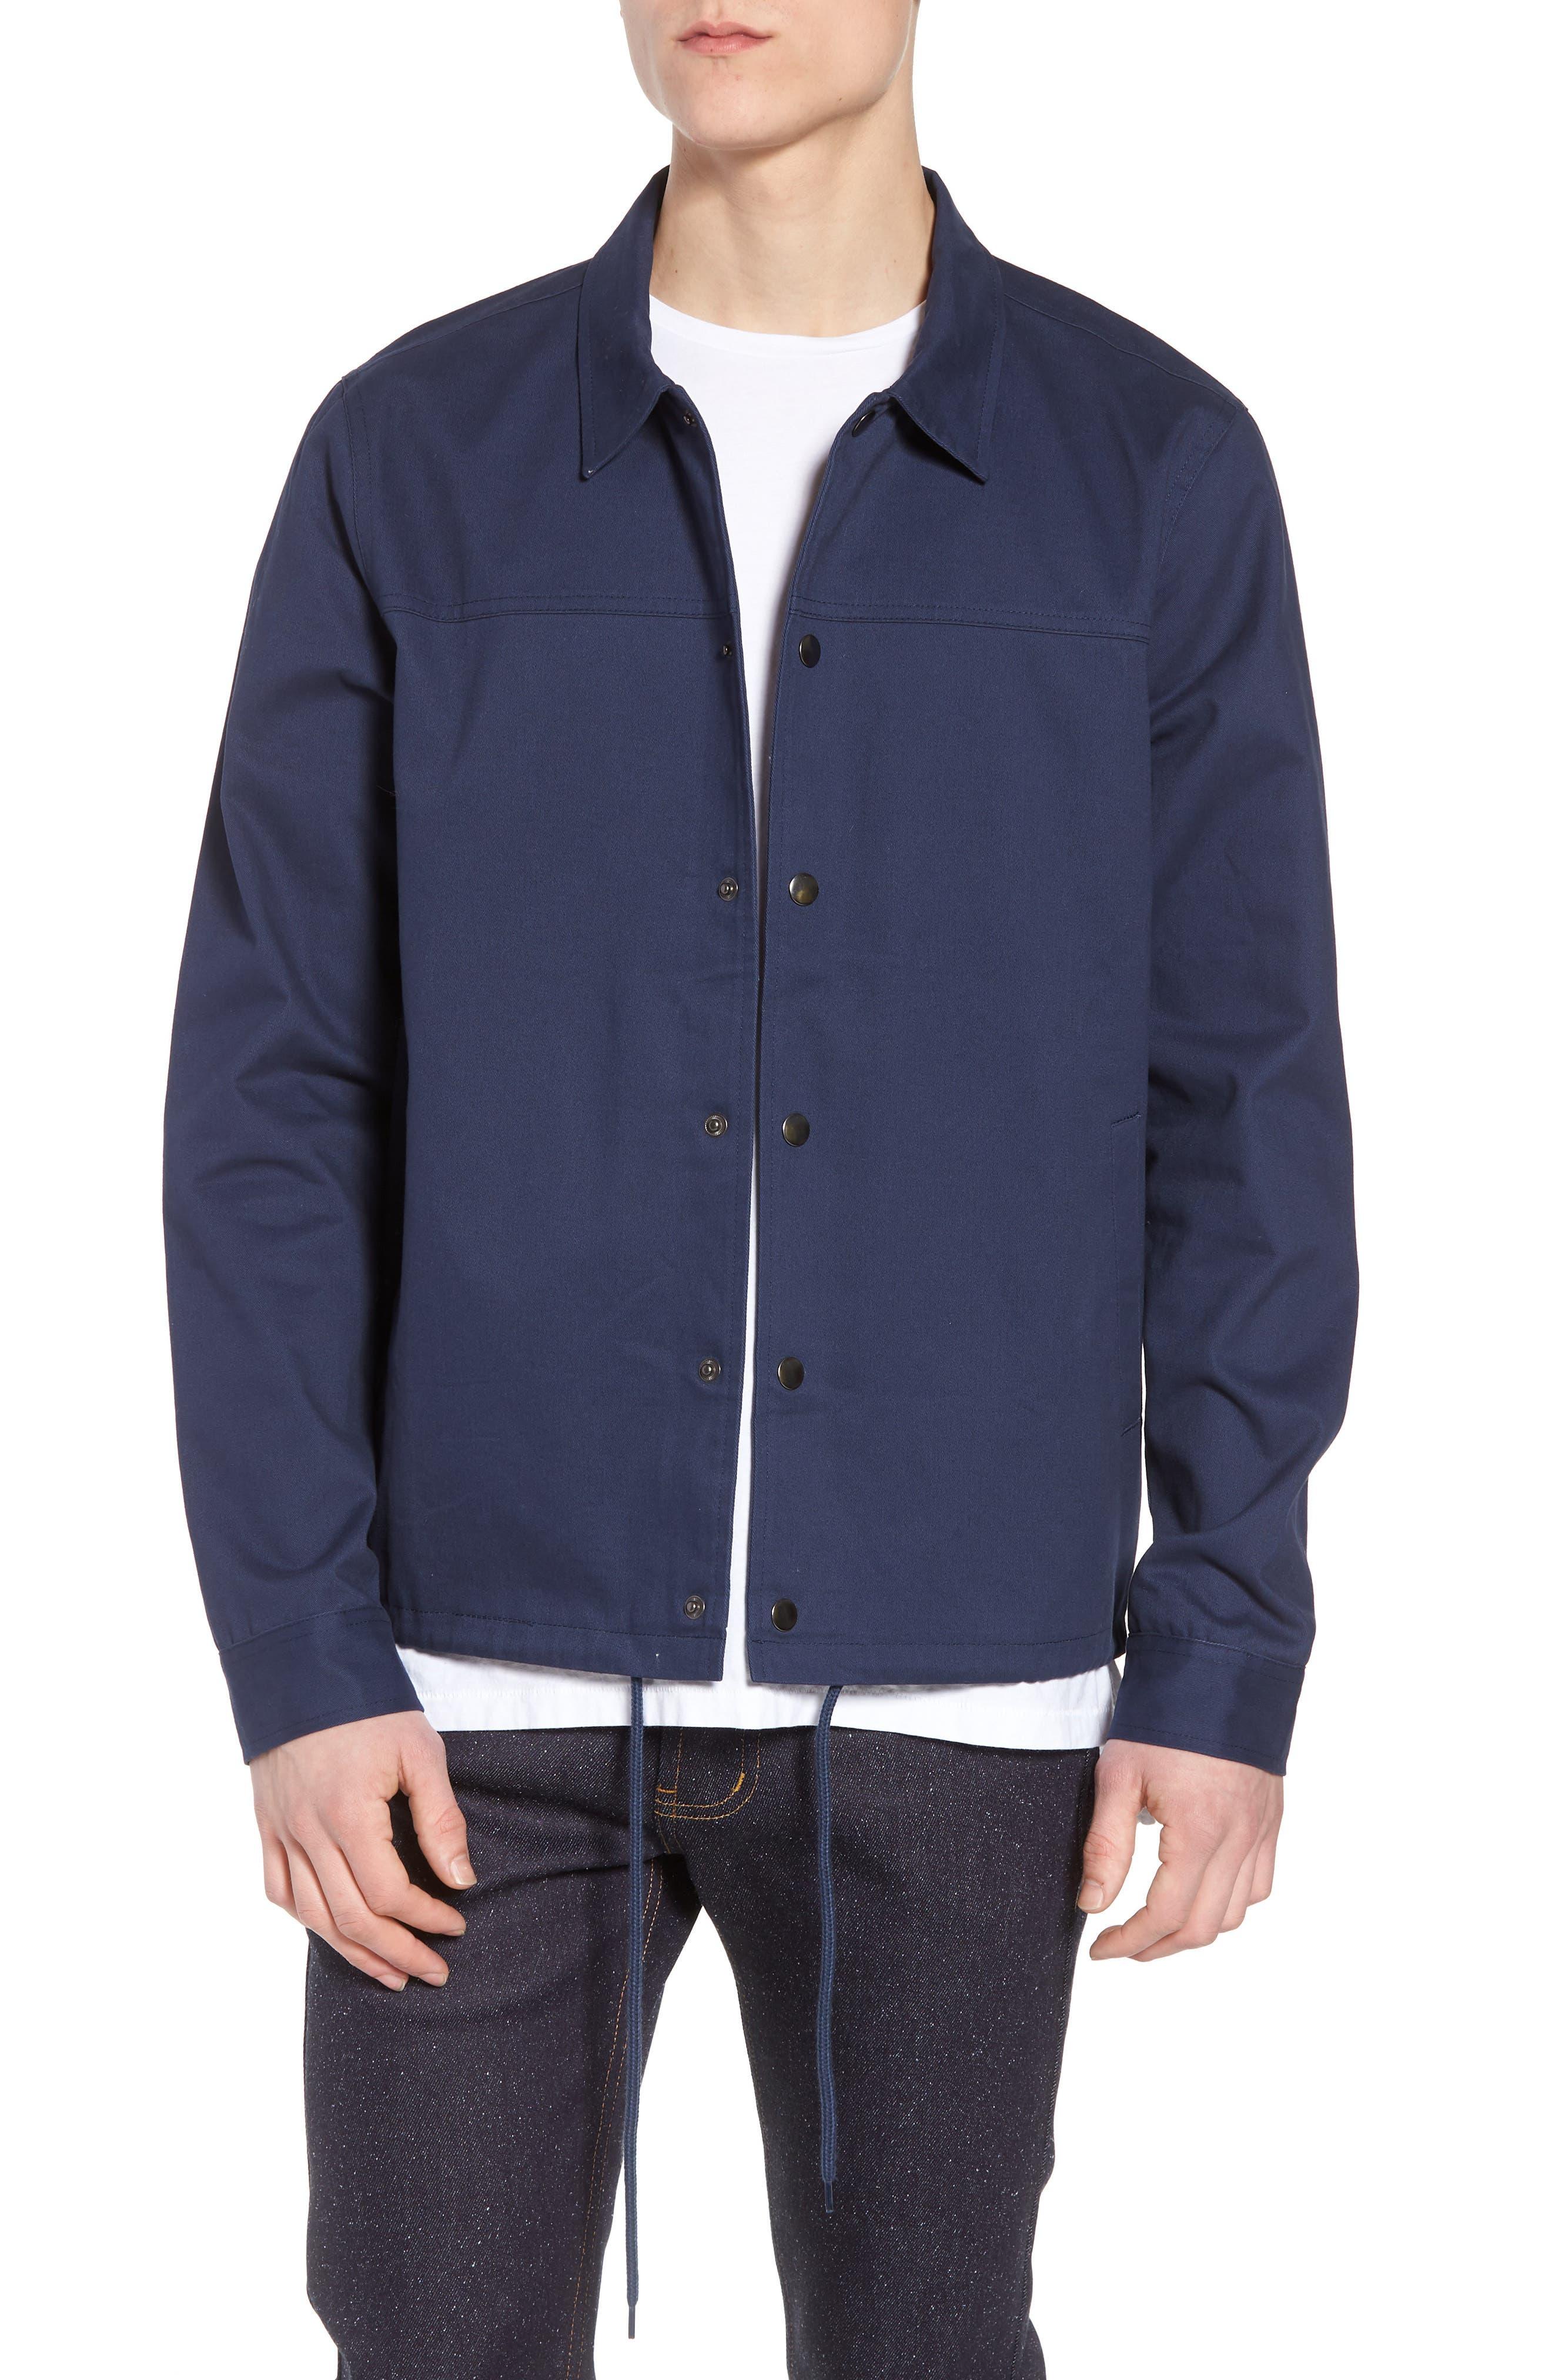 Snap Front Coach's Jacket,                             Main thumbnail 1, color,                             Navy Iris